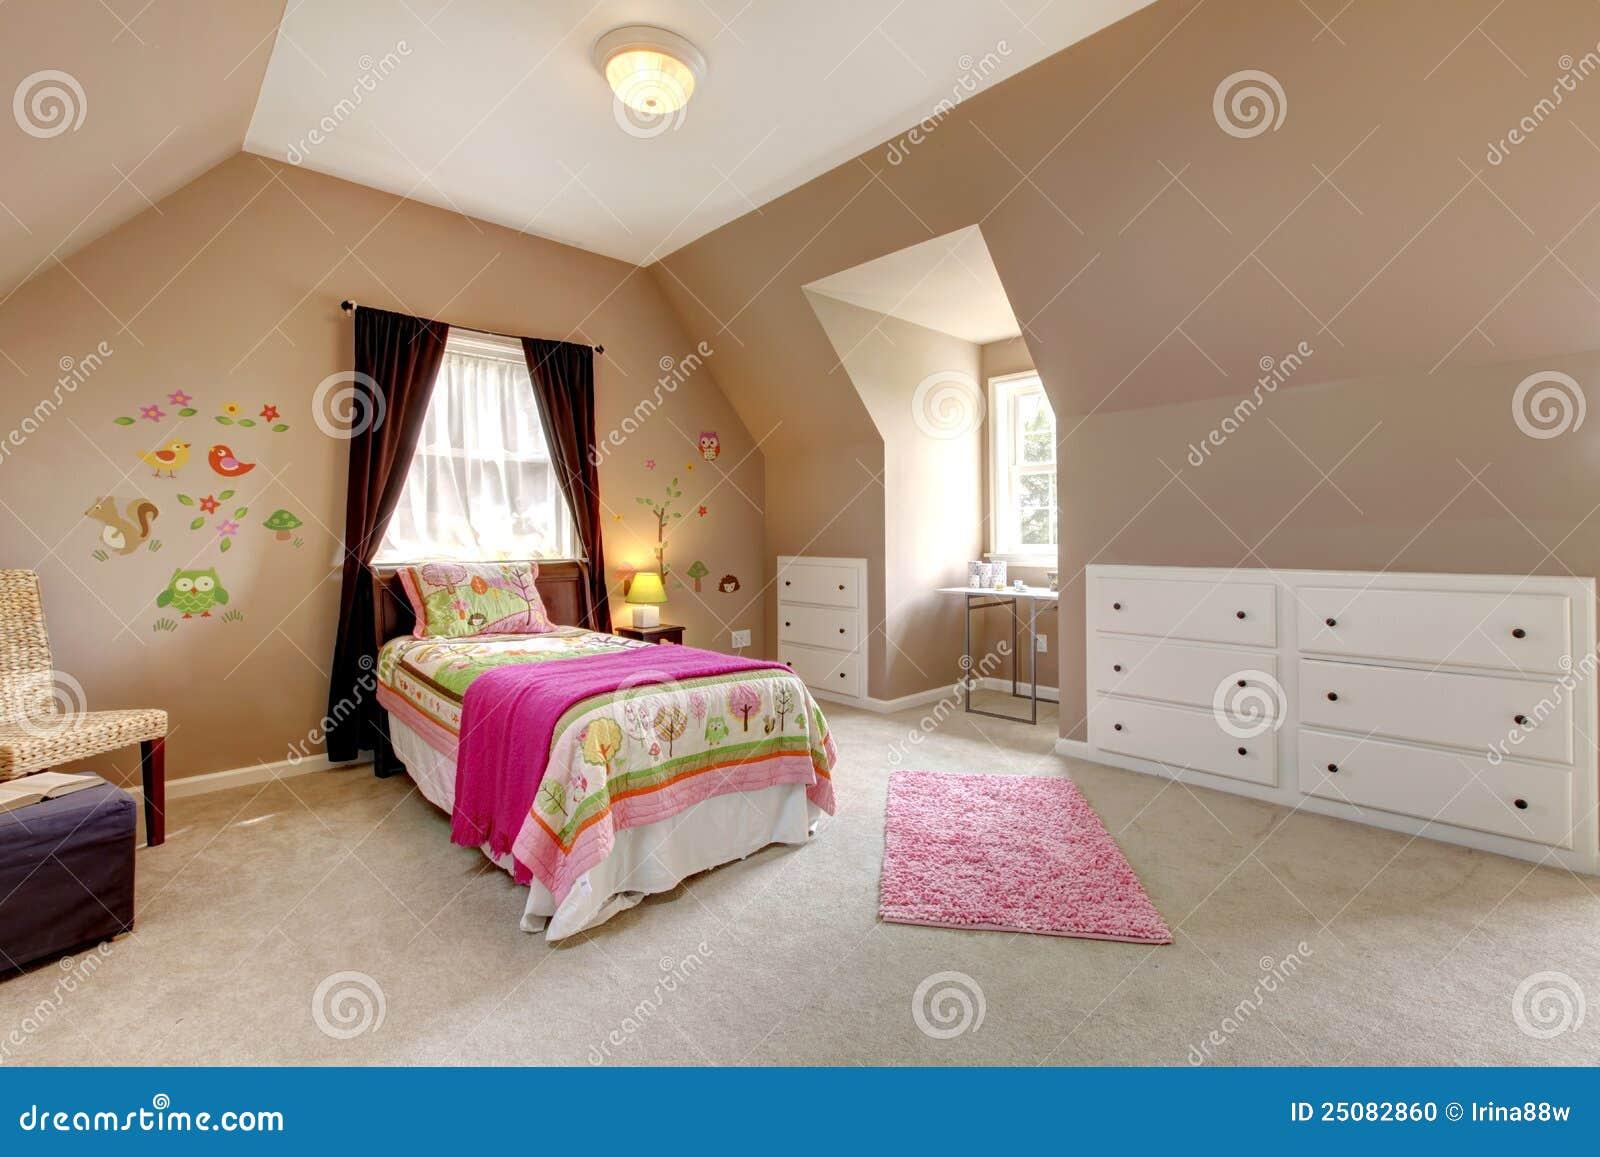 Slaapkamer Lamp Roze : Slaapkamer lamp roze referenties op huis ontwerp interieur